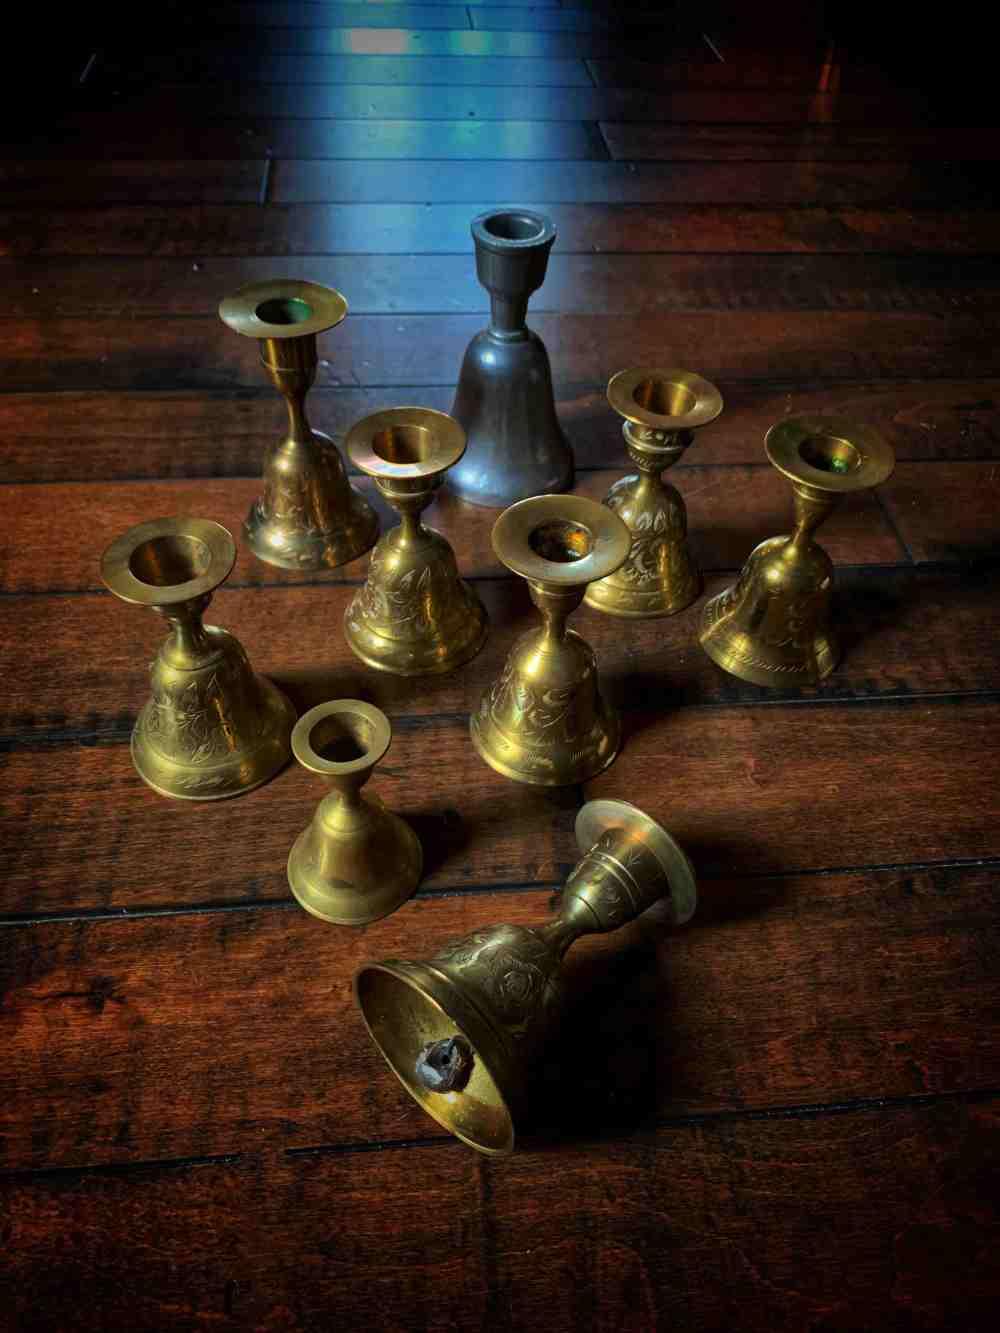 Brass Candlestick & Bell Vintage